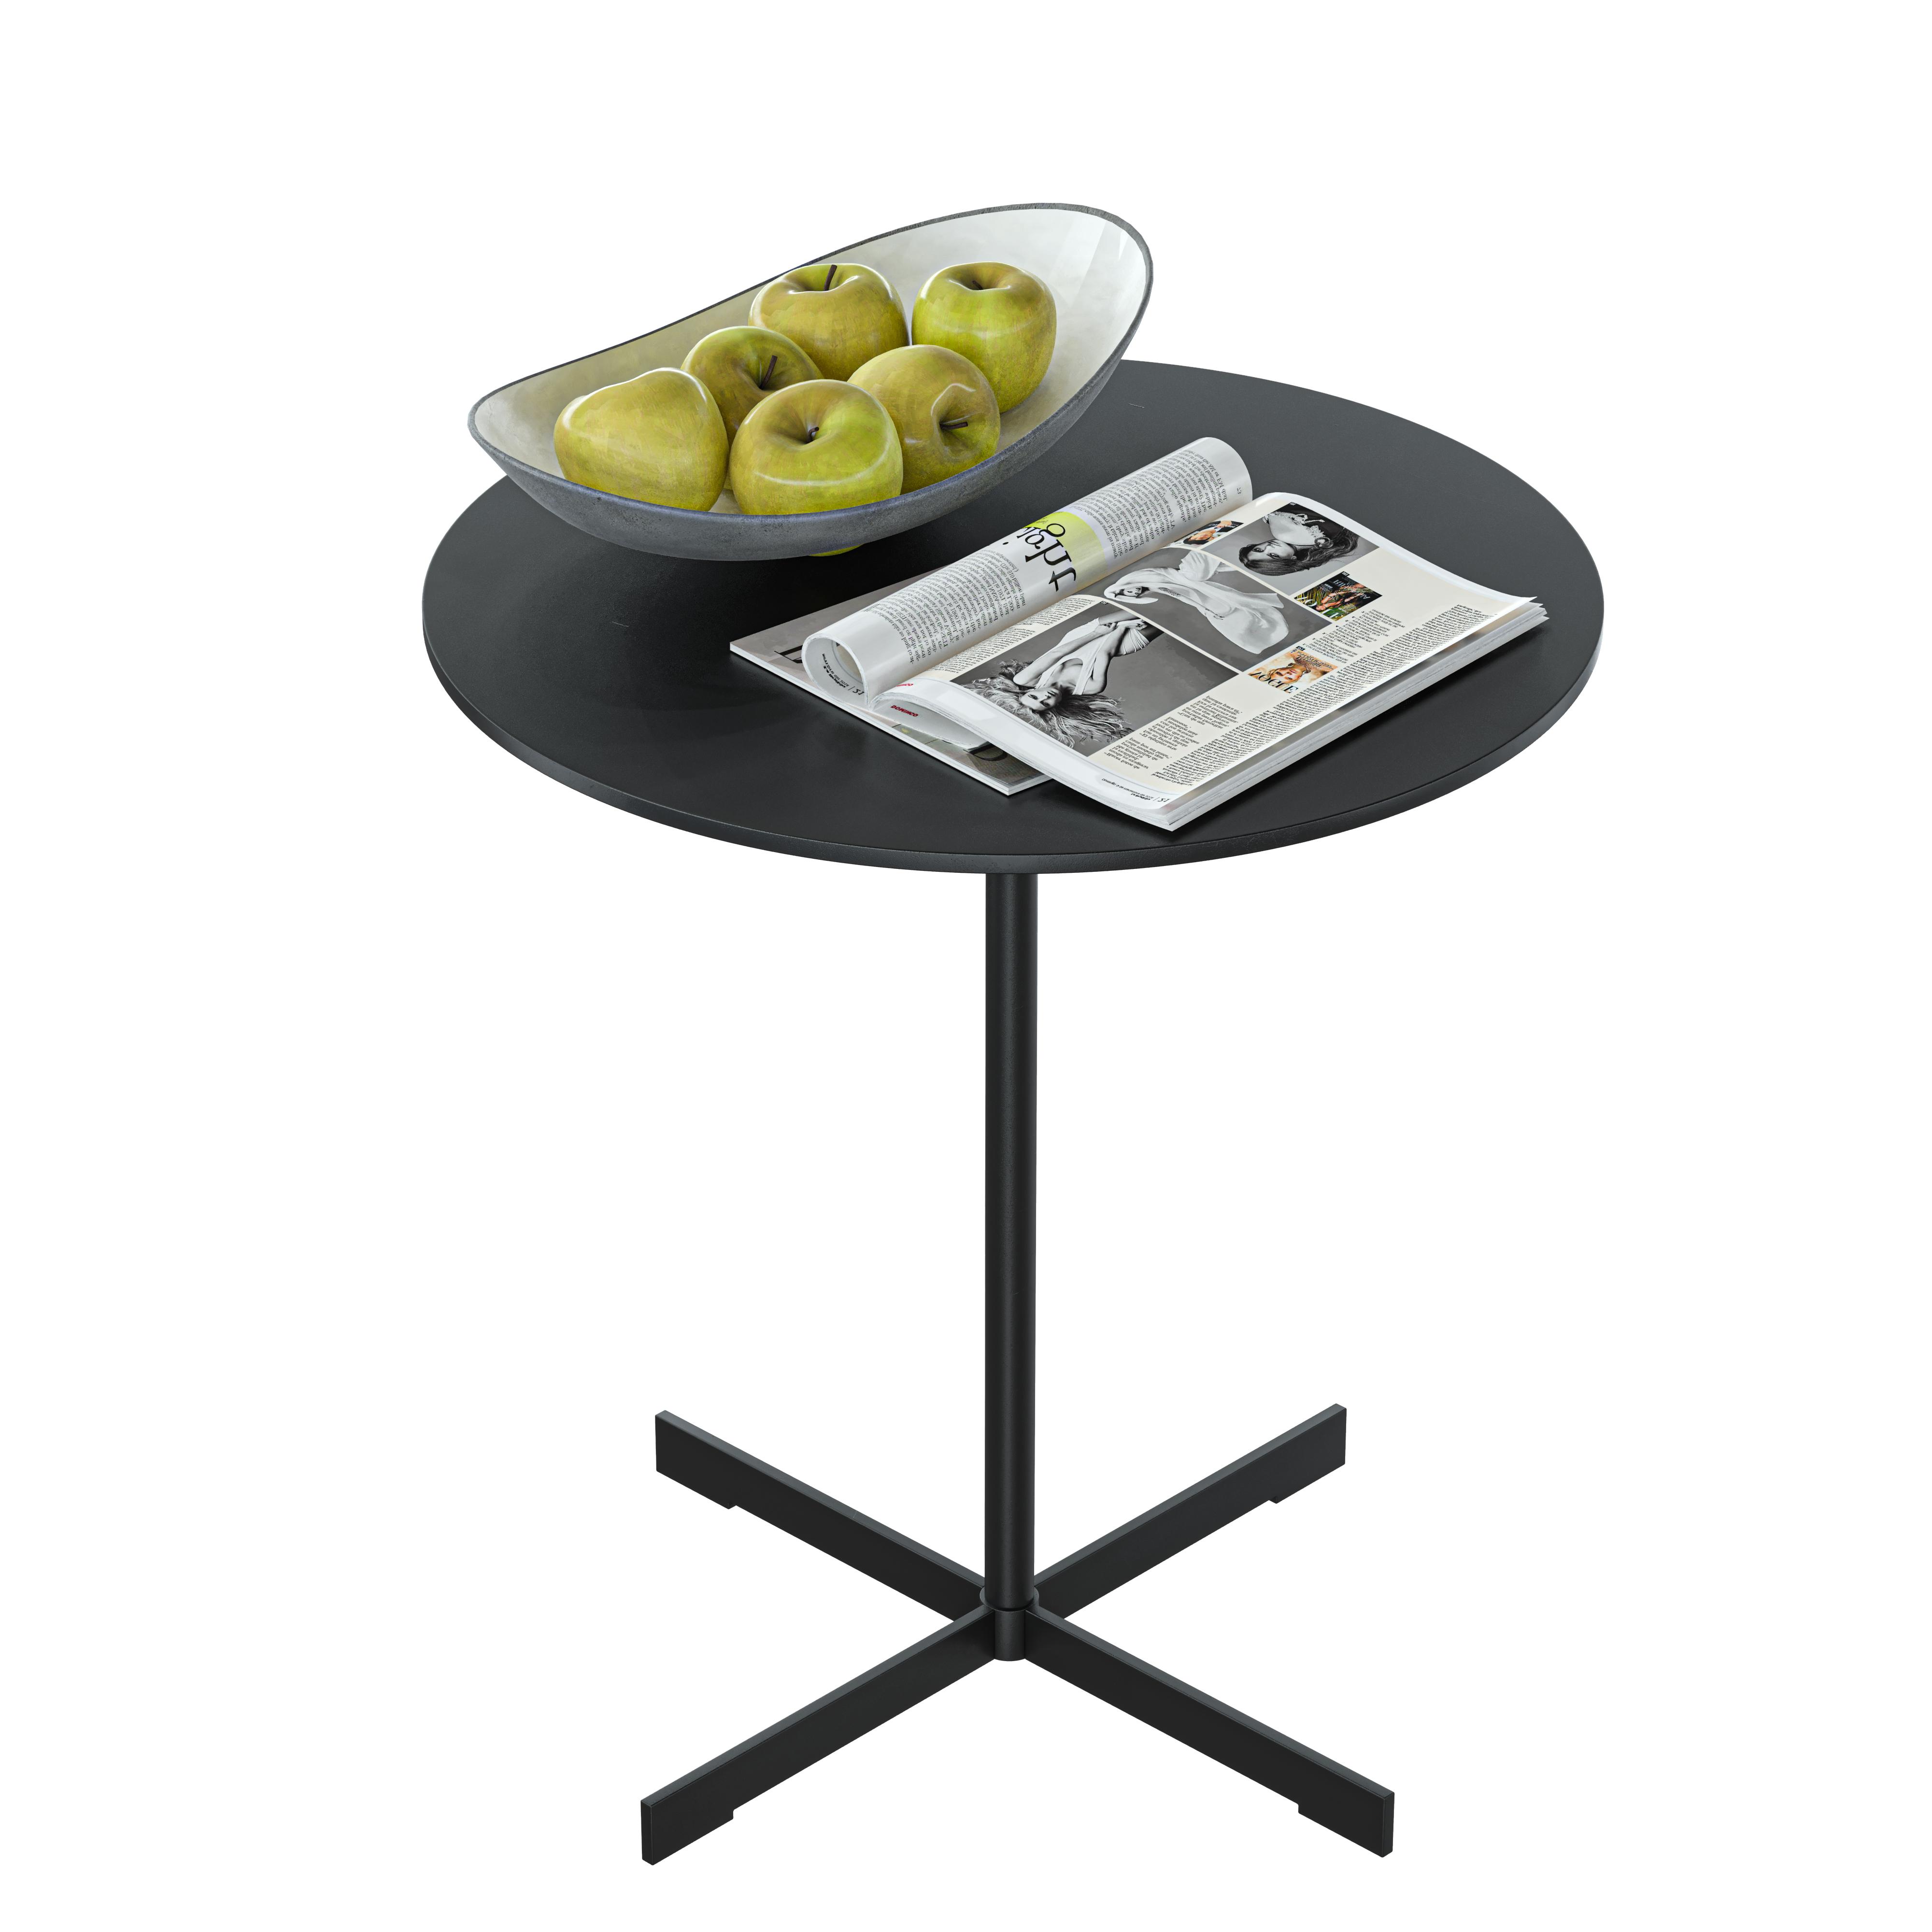 Nordic europe style furniture sets sand pattern metal frame round design outdoor bar set table